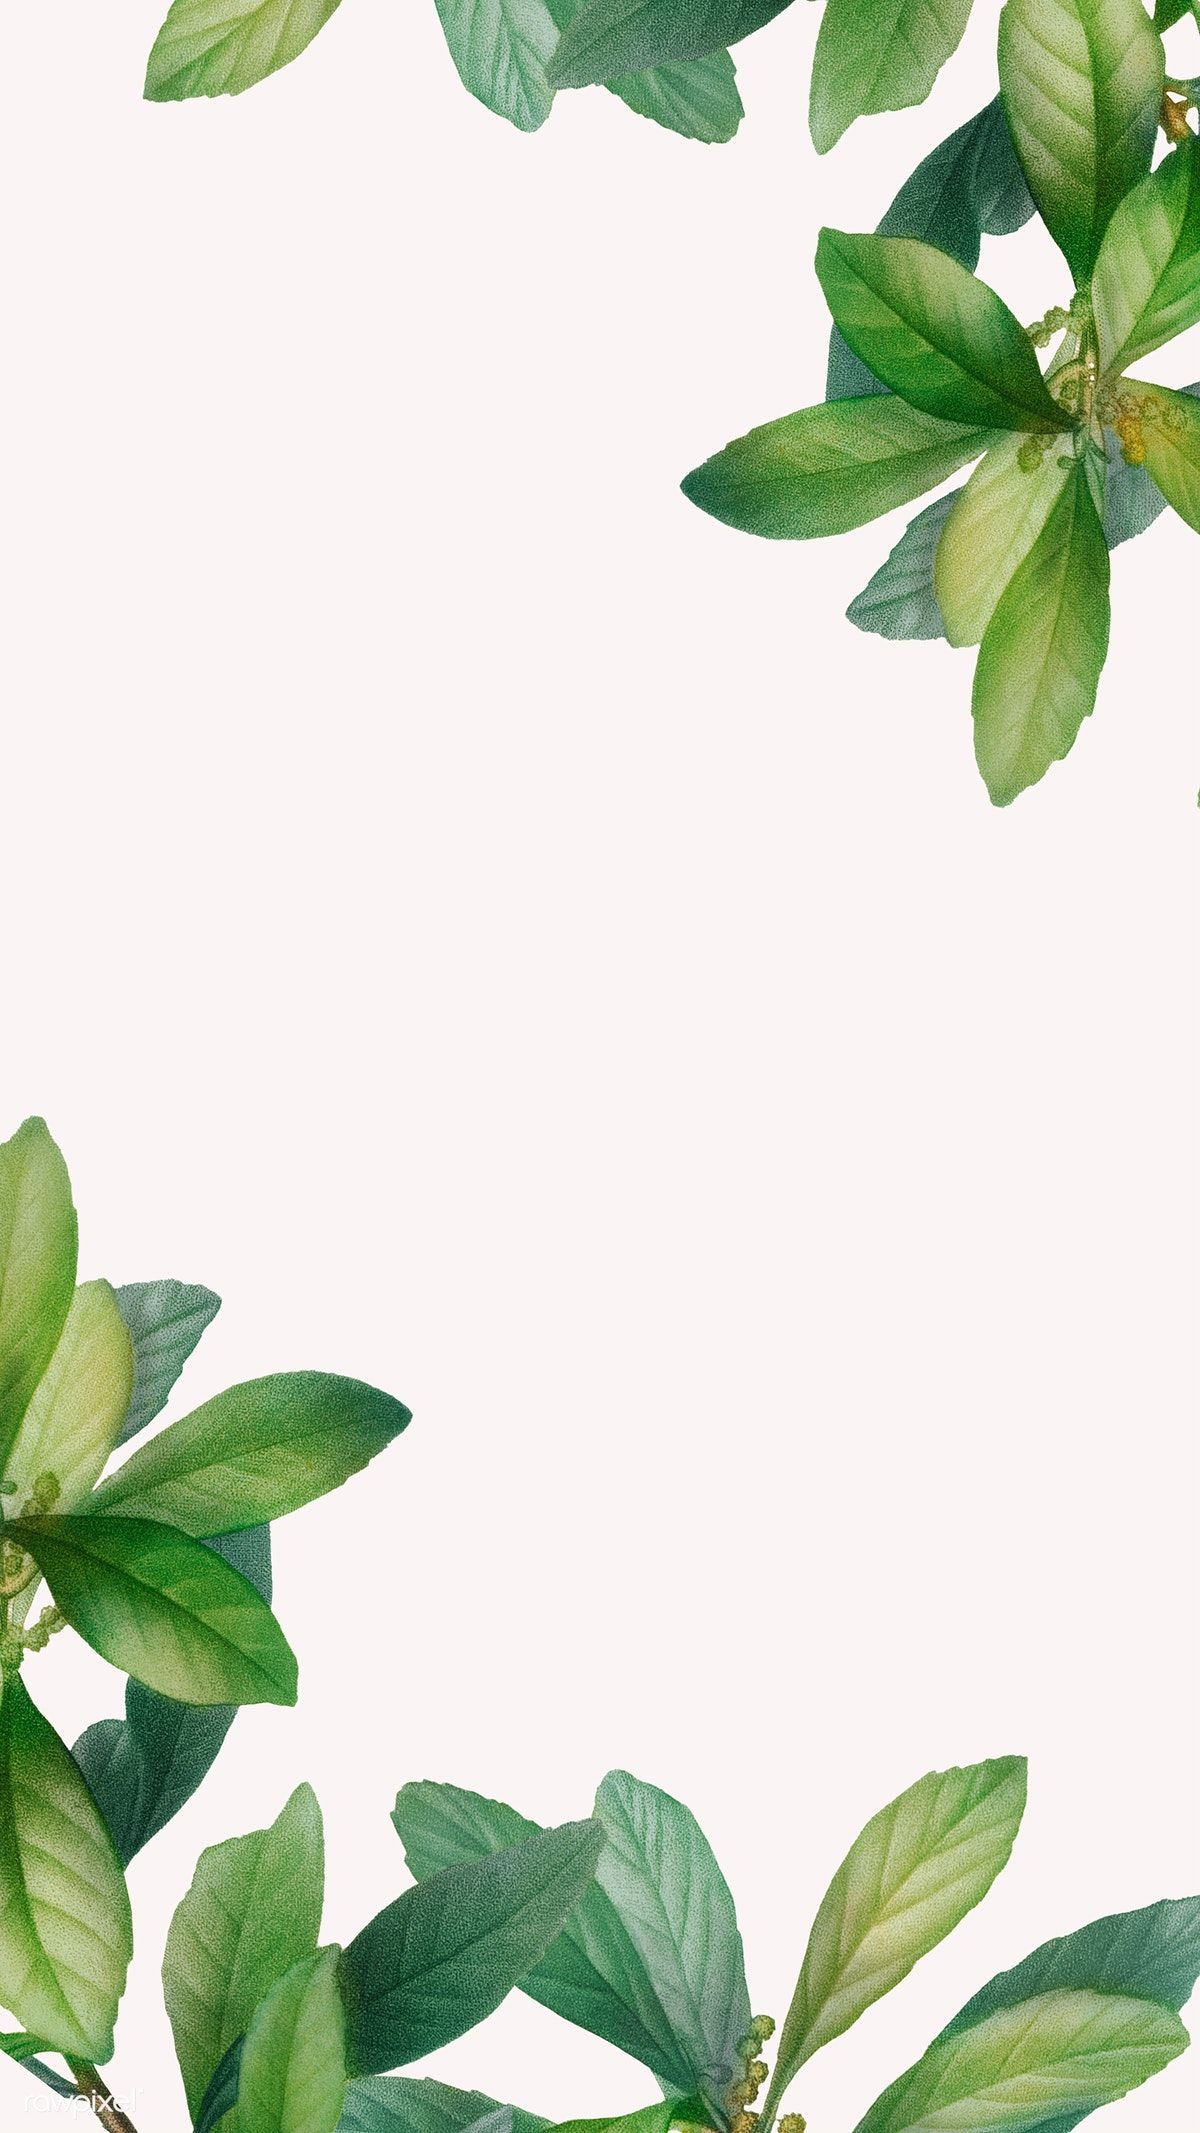 Download premium illustration of Tropical botanical leaves background